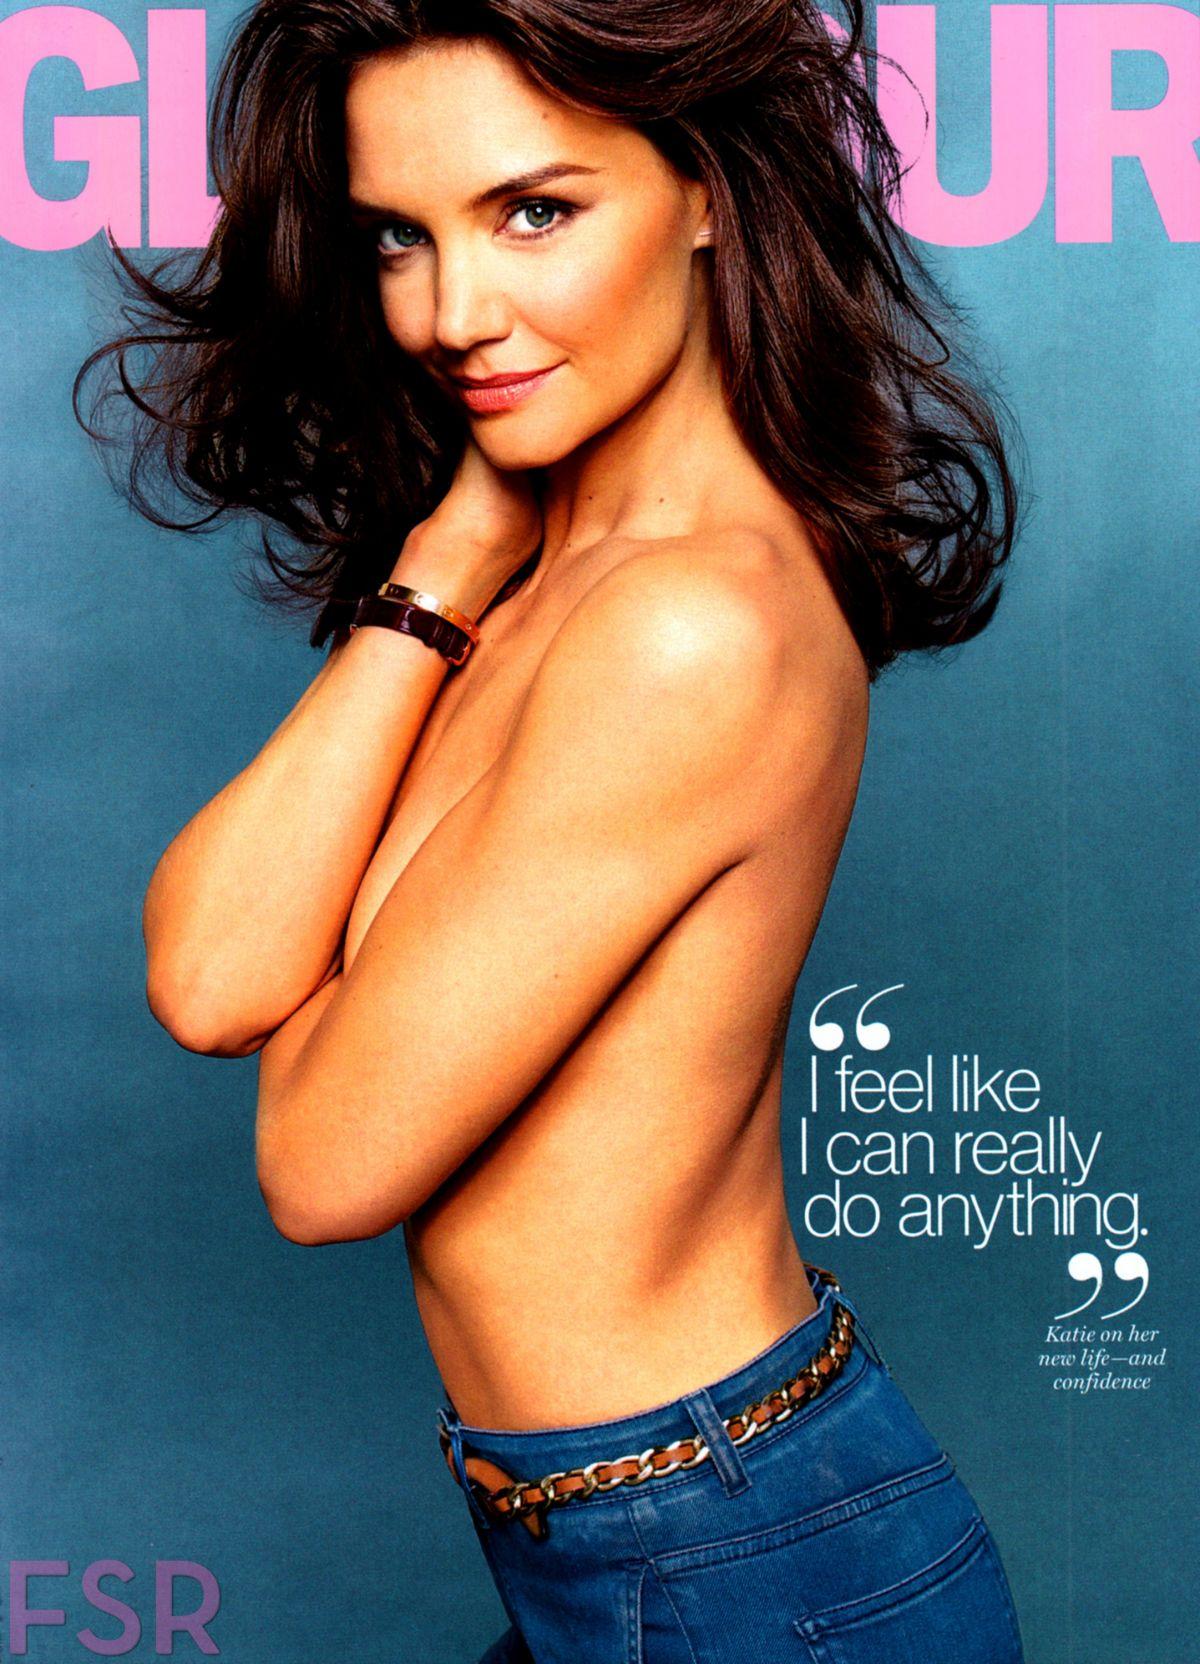 KATIE HOLMES in Glamour Magazine, August 2014 Issue